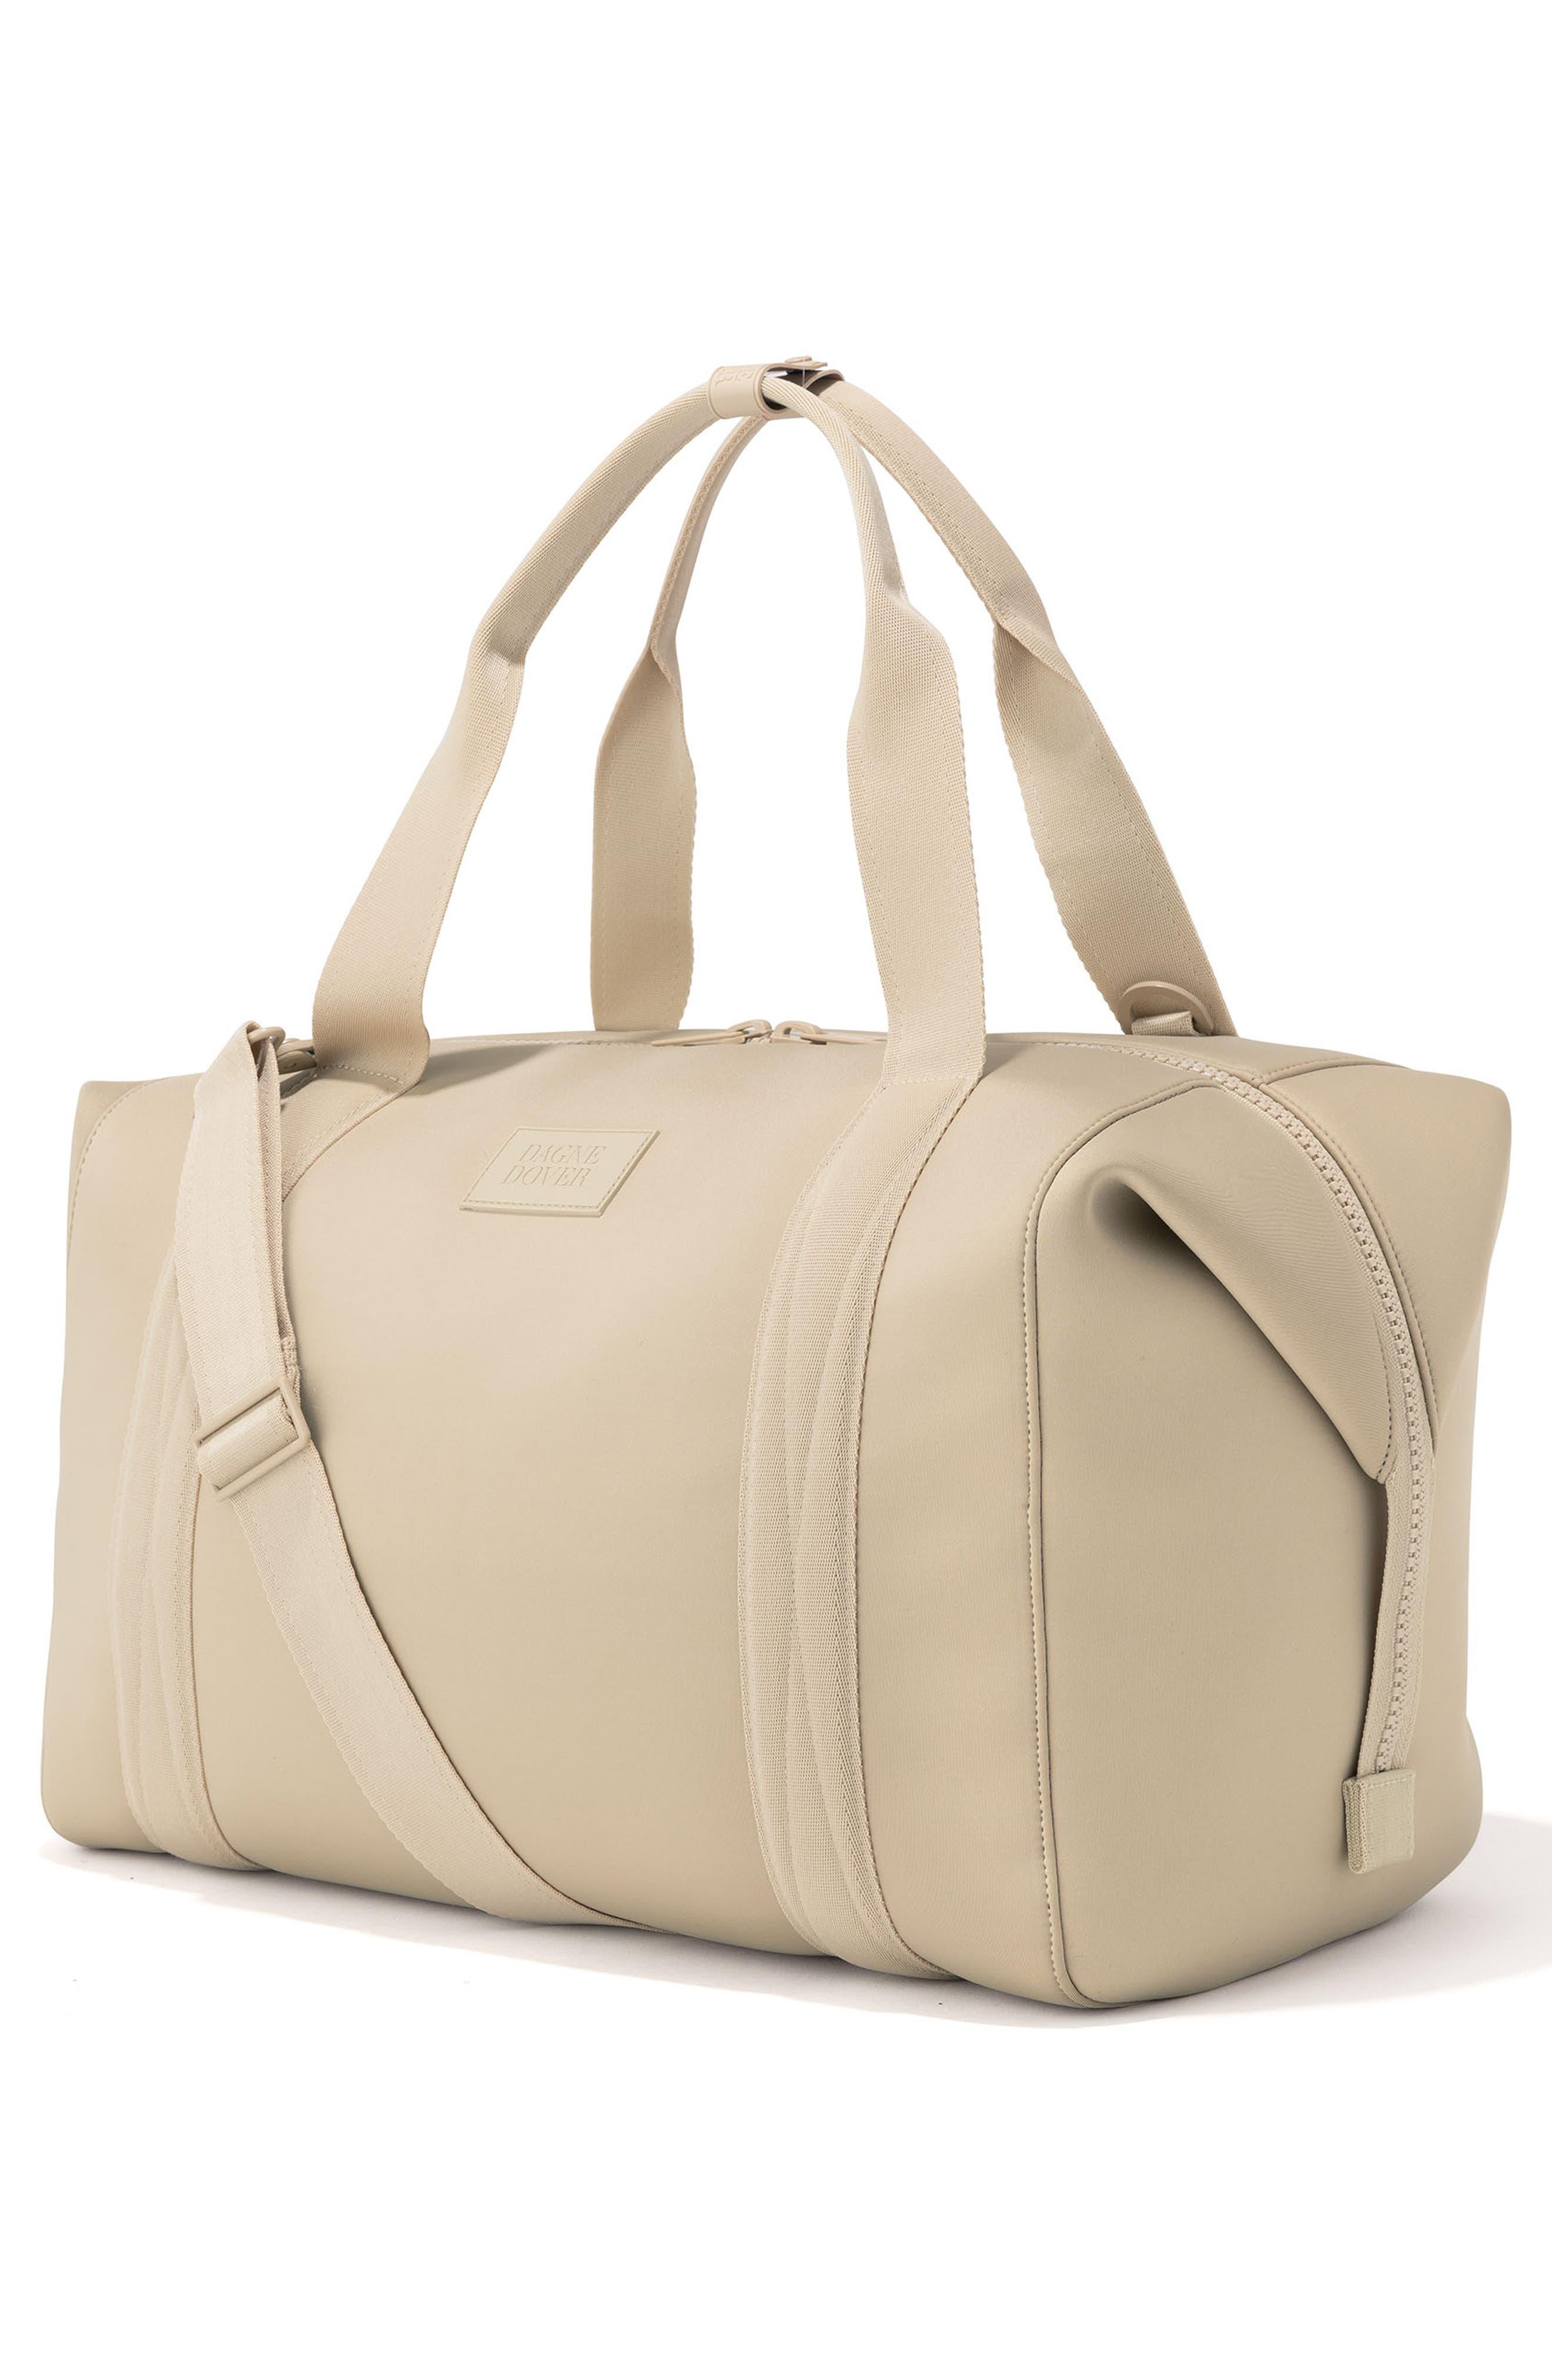 DAGNE DOVER, XL Landon Carryall Duffel Bag, Alternate thumbnail 4, color, ALMOND LATTE